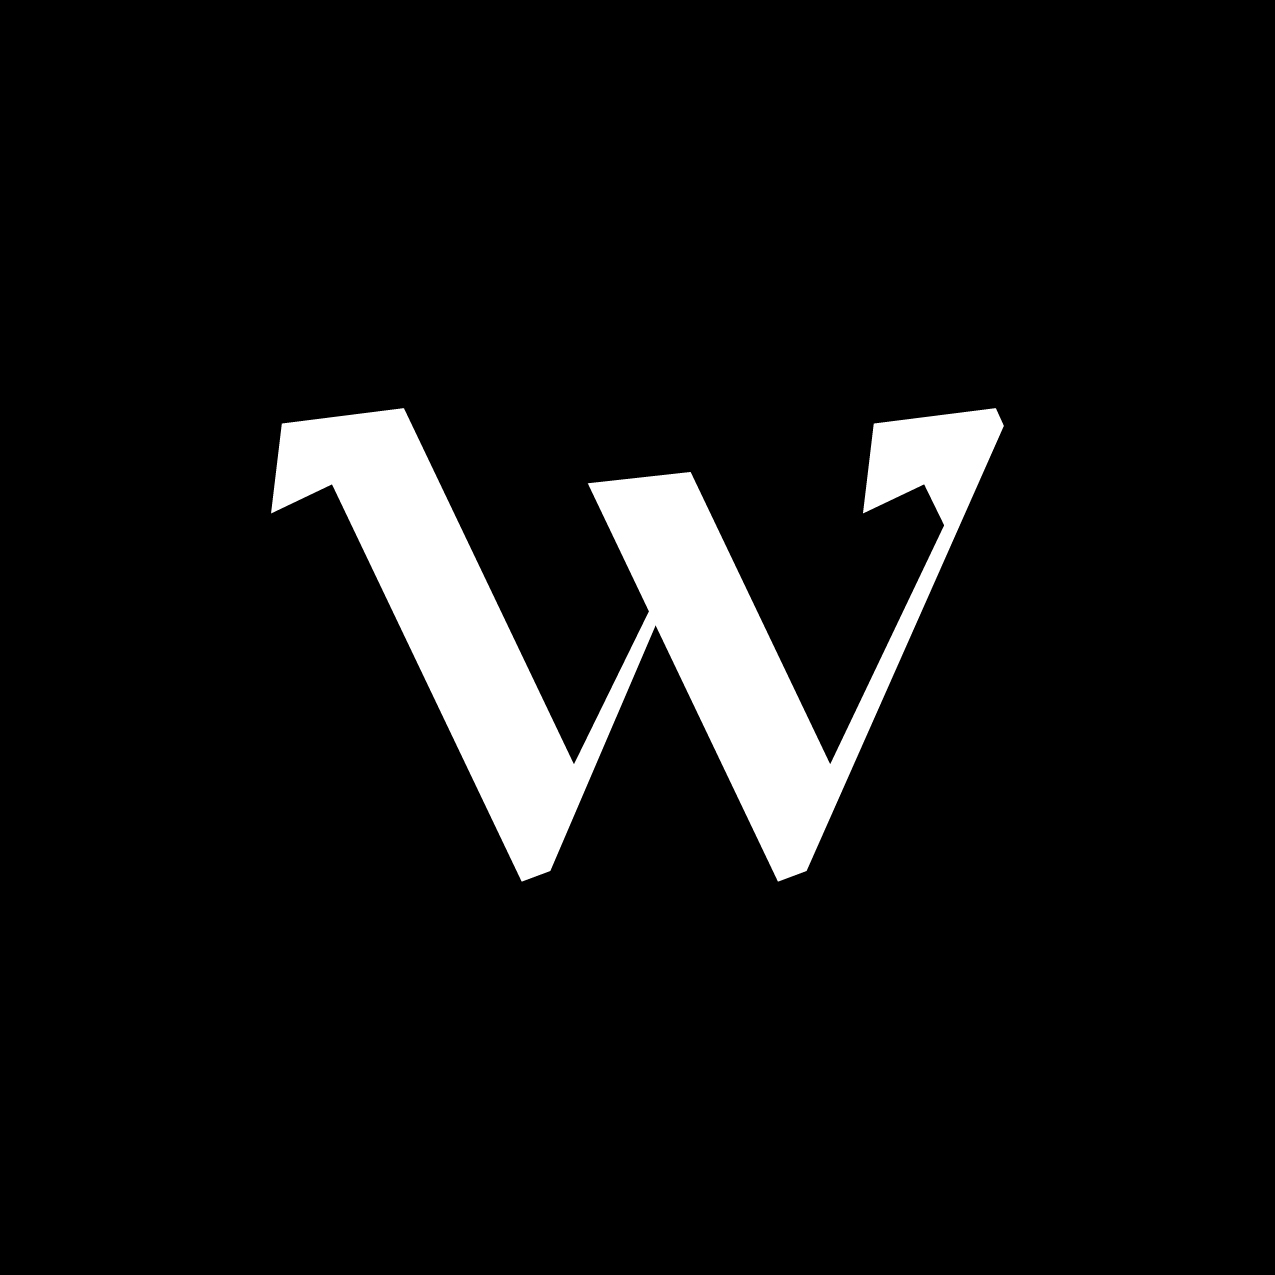 Letter W9 Design by Furia